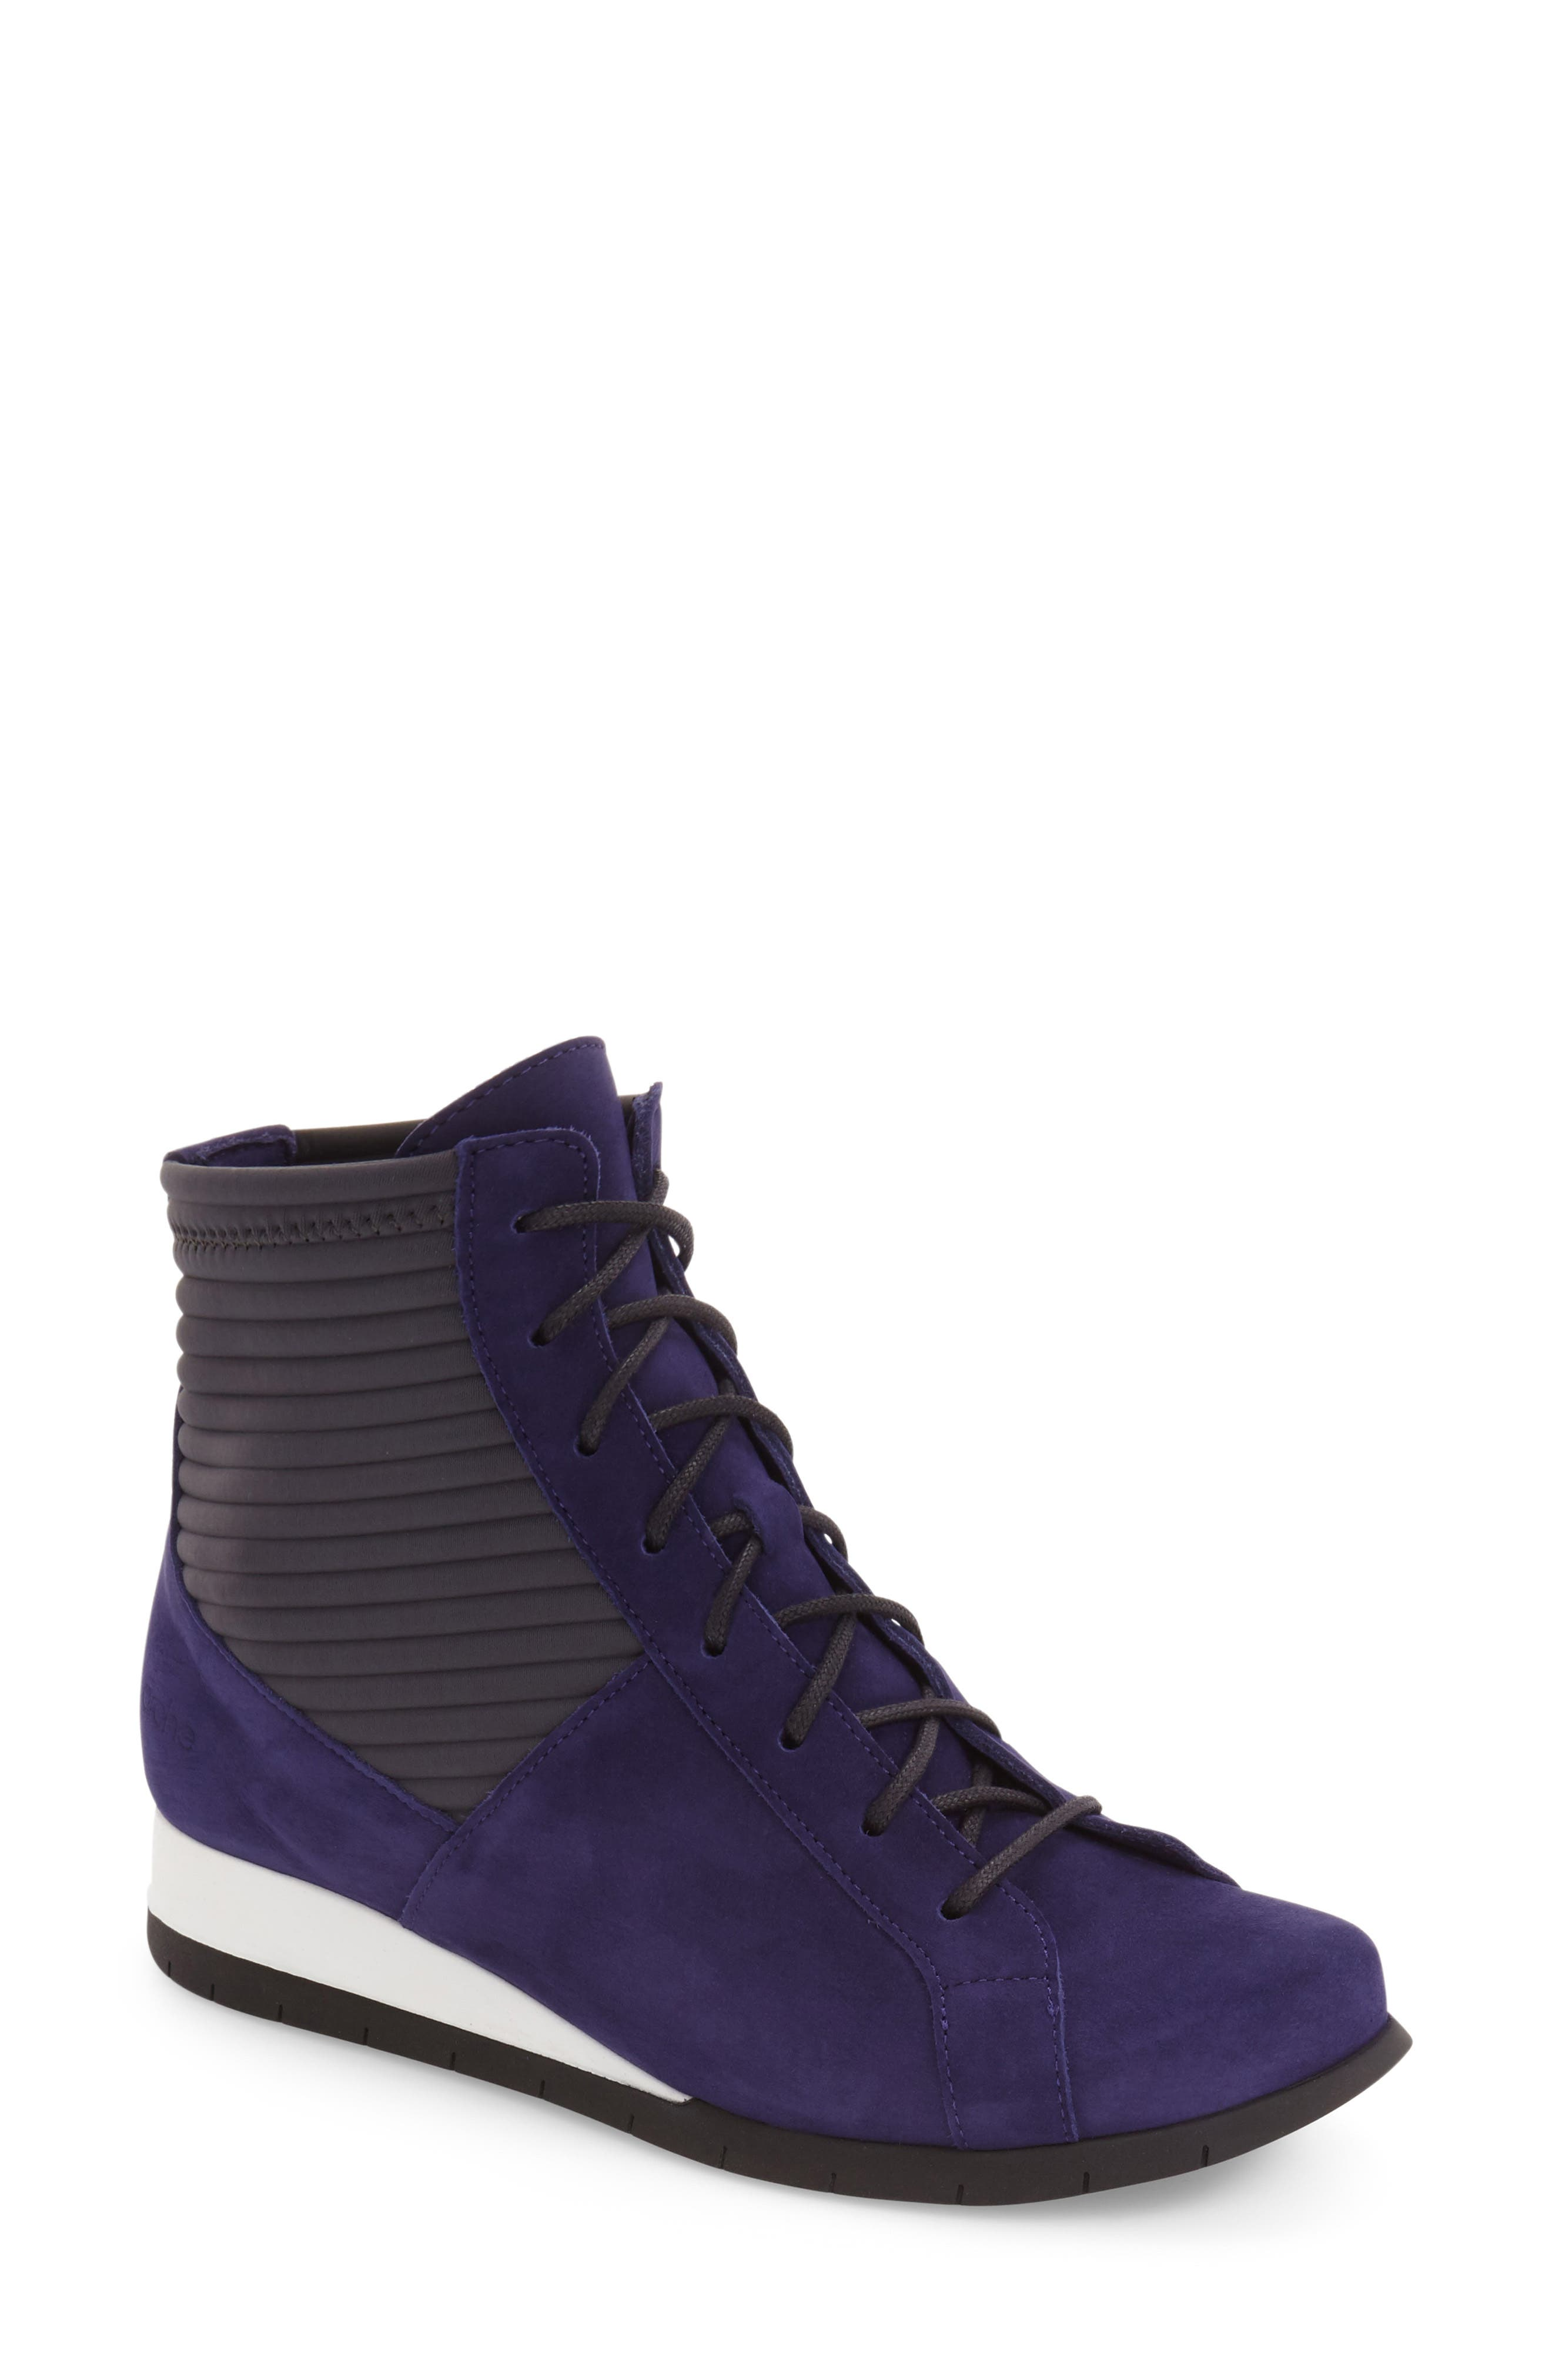 Main Image - Arche 'Situ' Wedge High Top Sneaker (Women)